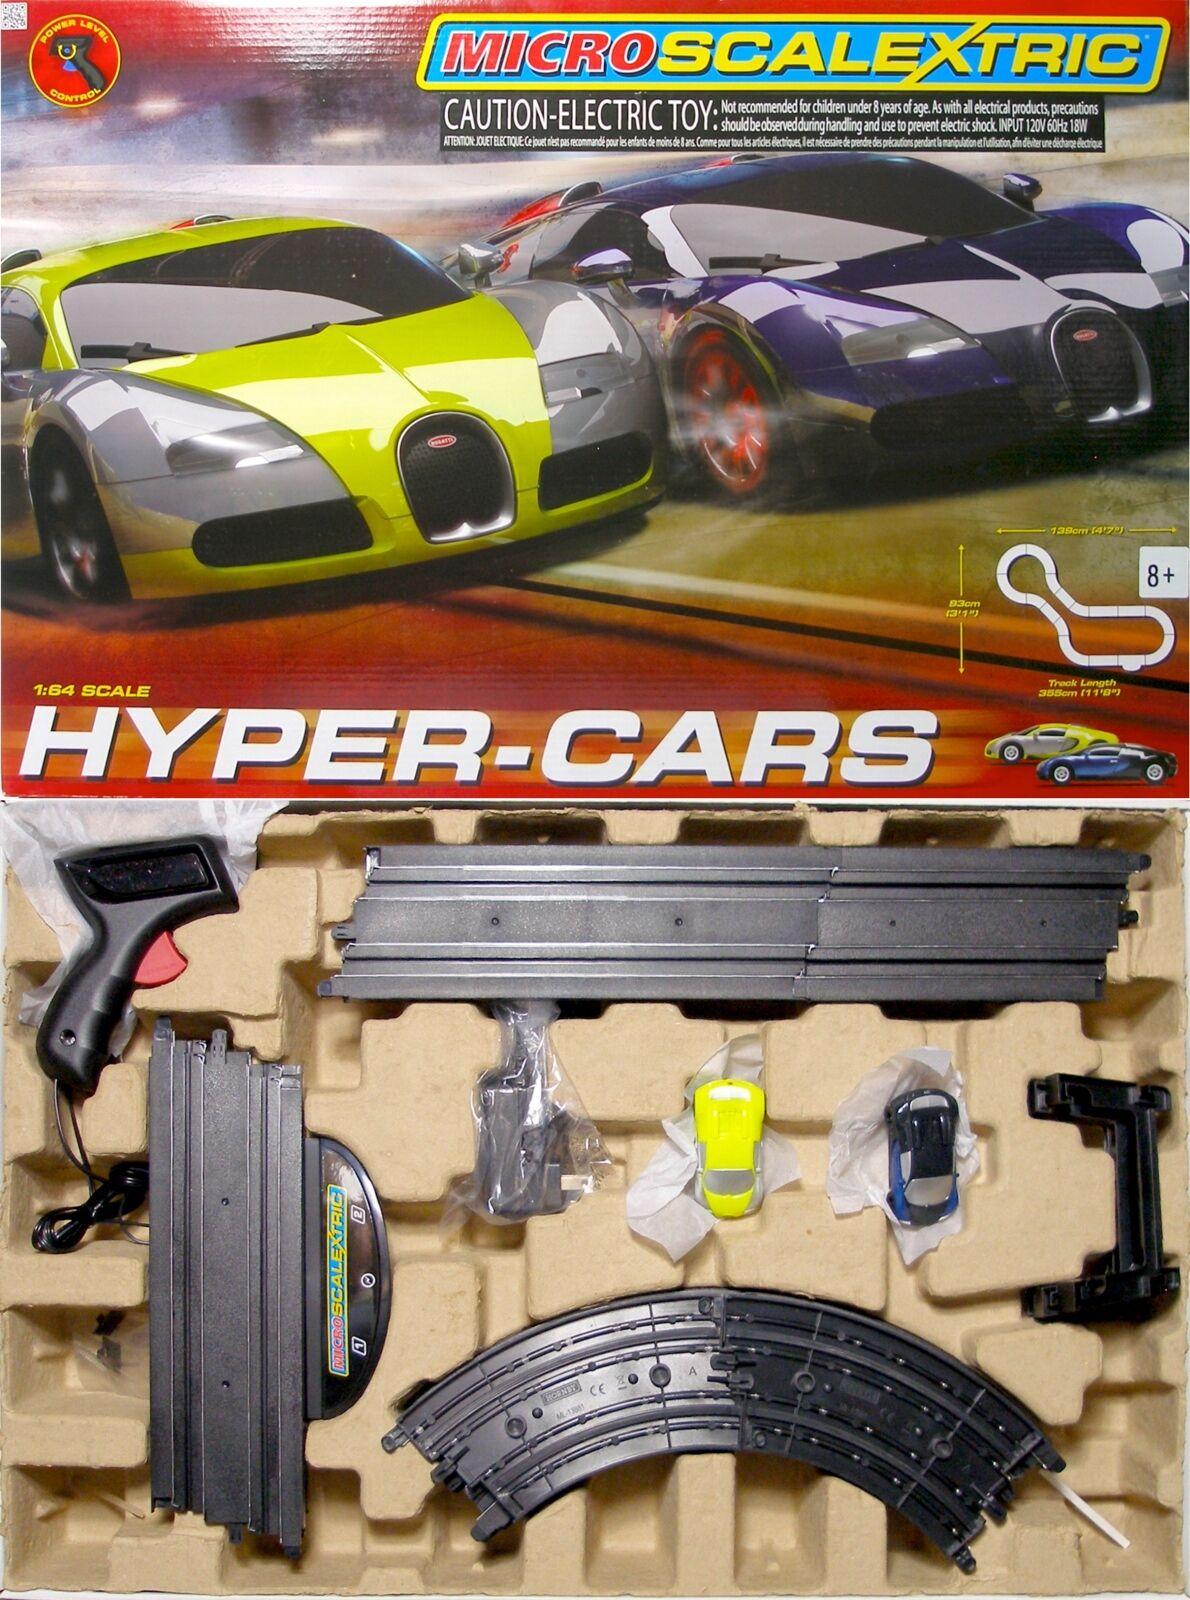 2015 Micro Scalextric Bugatti Veyron Hyper ho slot car Nice Race Set 1 64 G1108